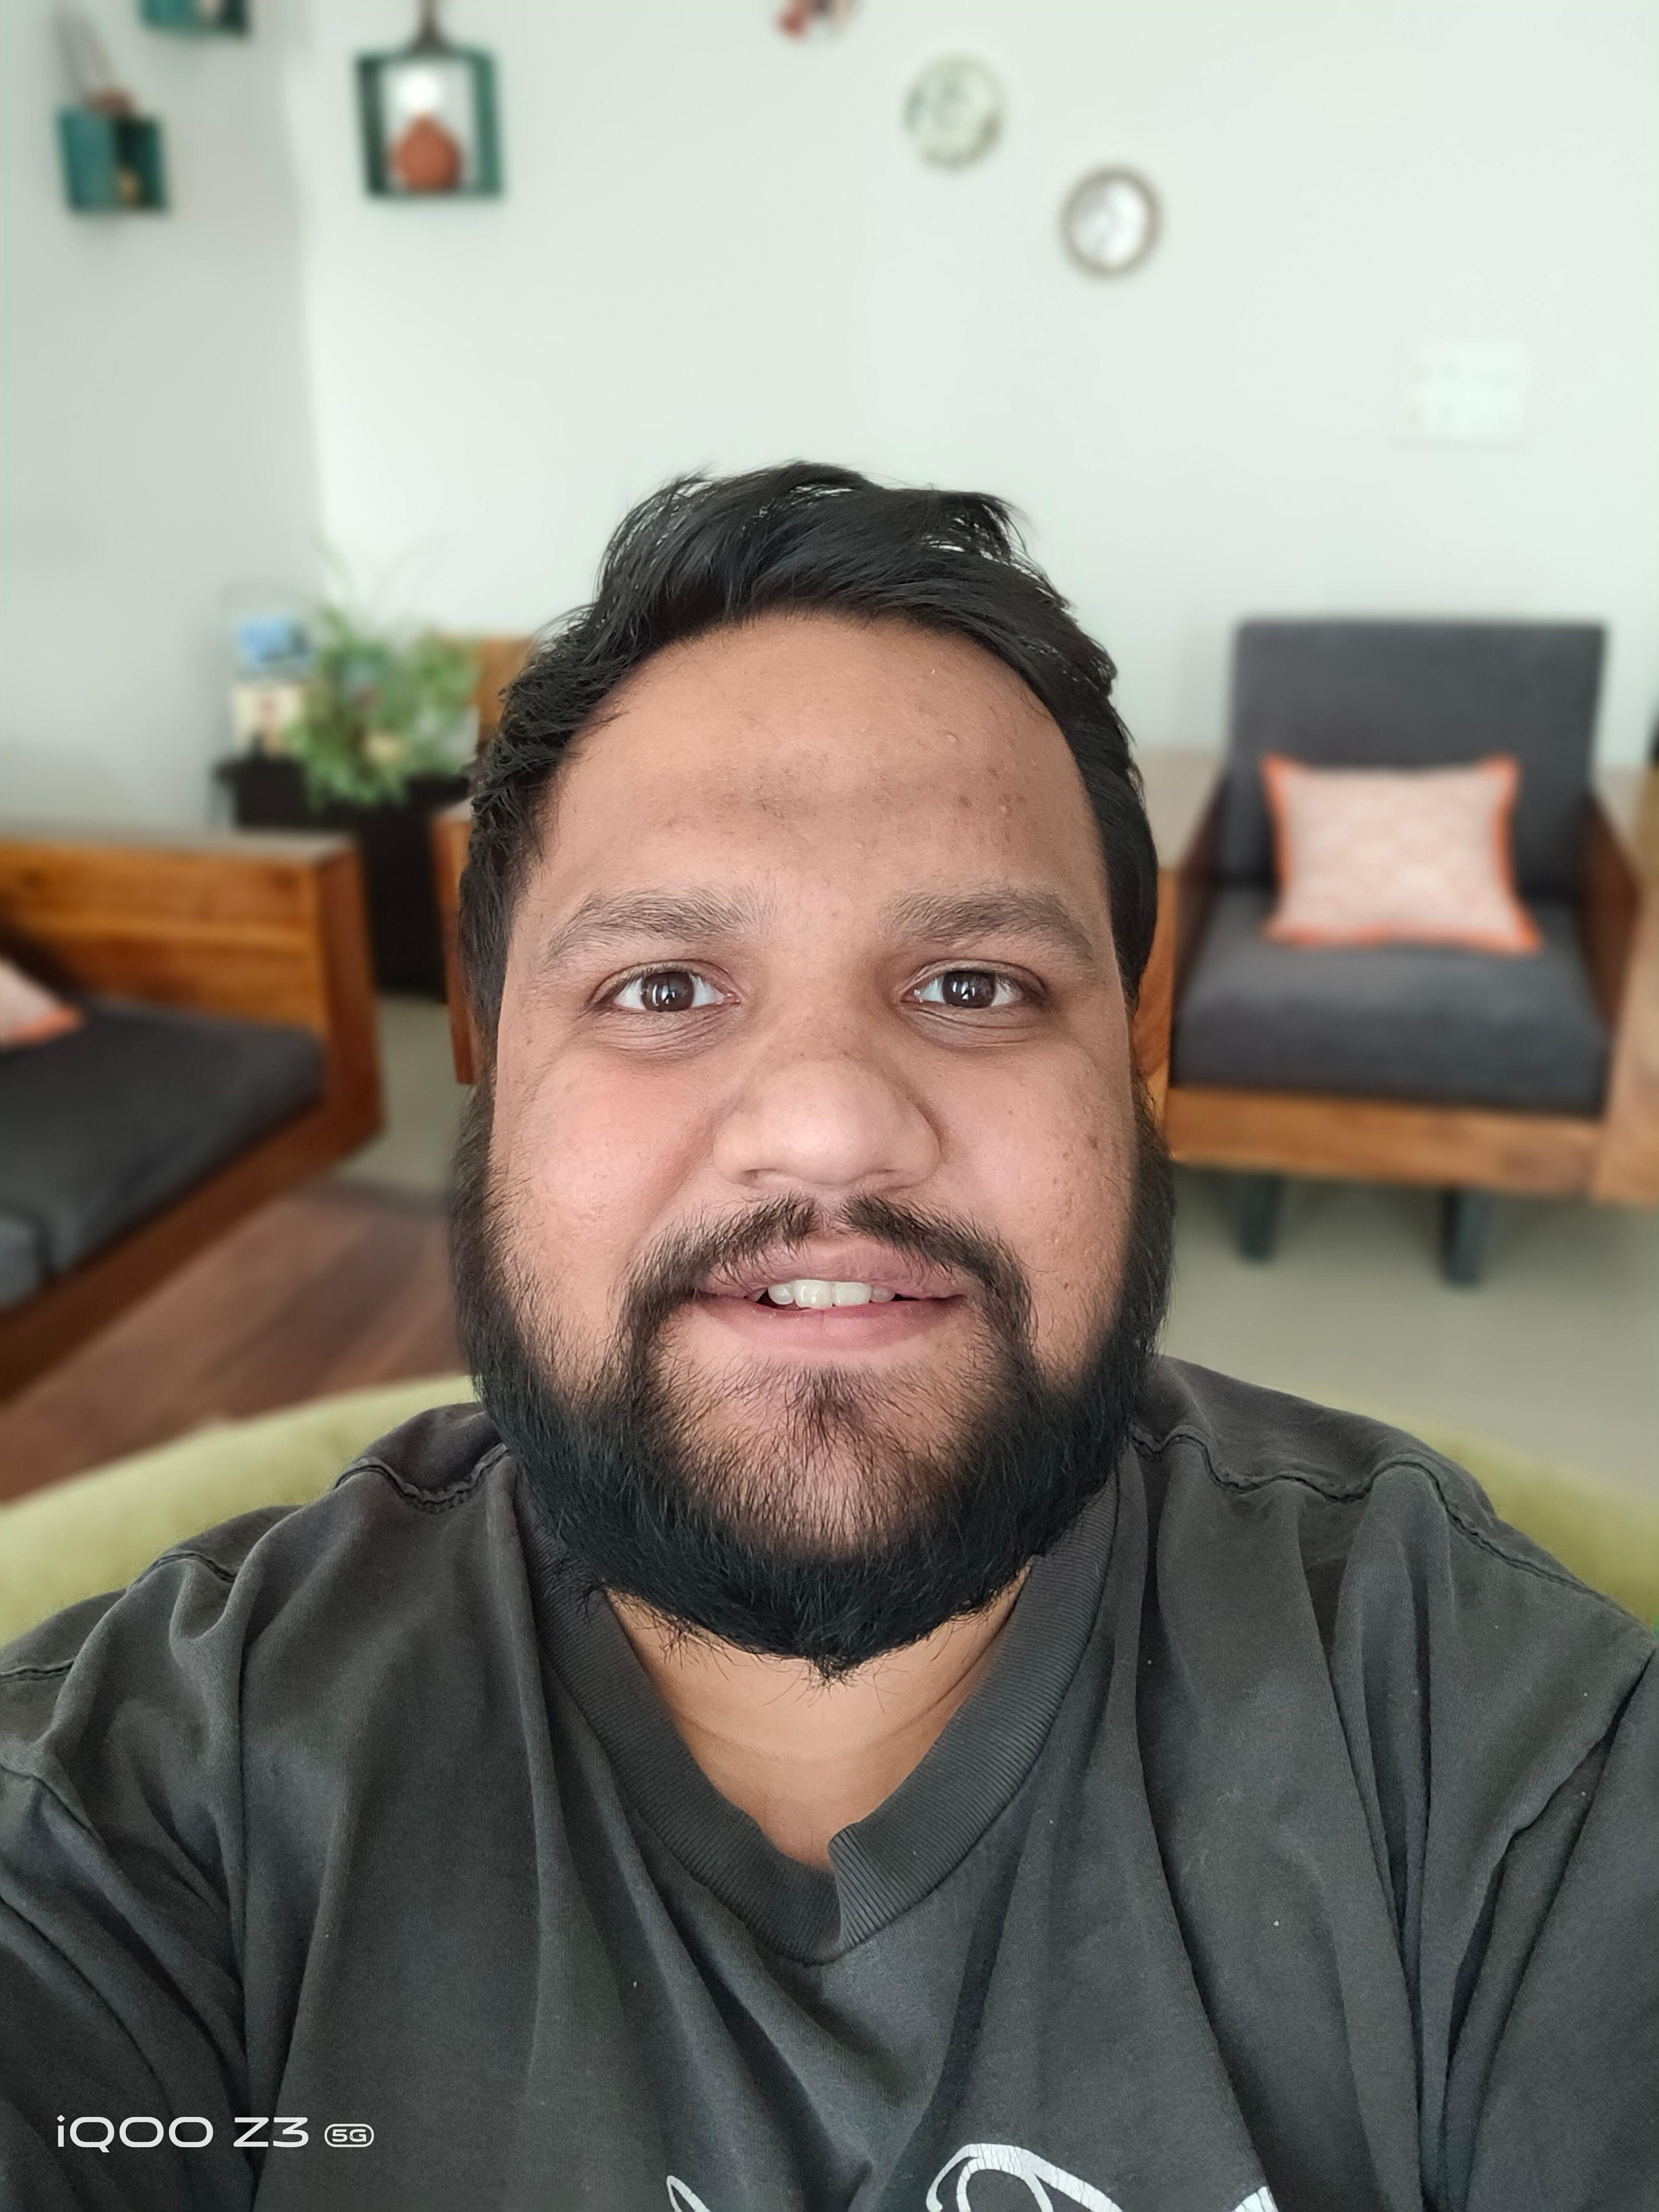 iQOO Z3 5G Camera Selfie Portrait